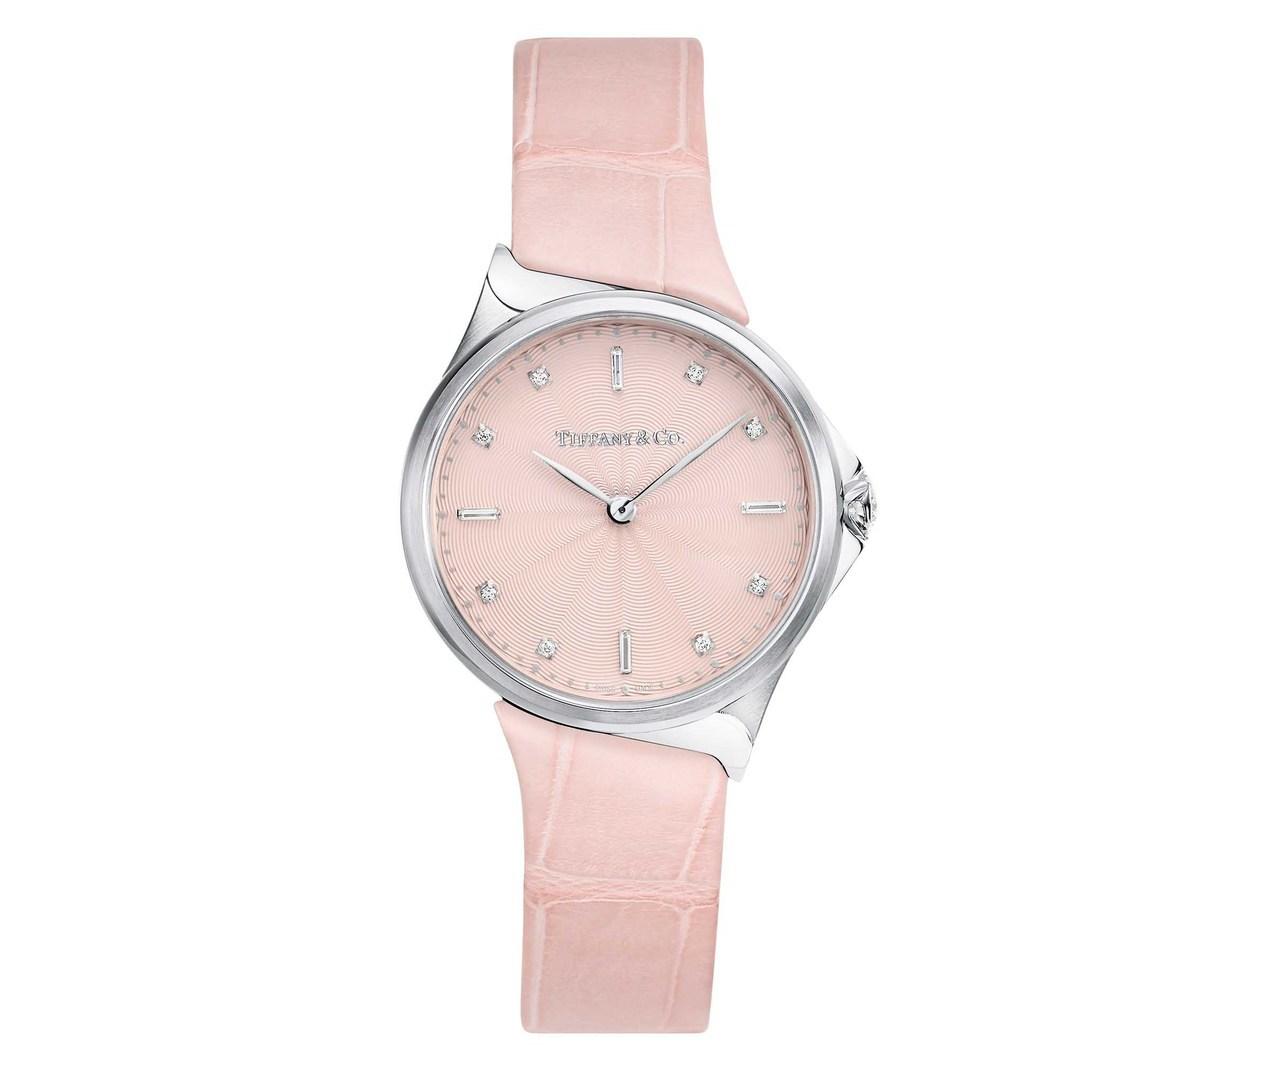 Tiffany Metro 28mm 不鏽鋼粉色鱷魚皮錶帶腕錶 NT$136,0...